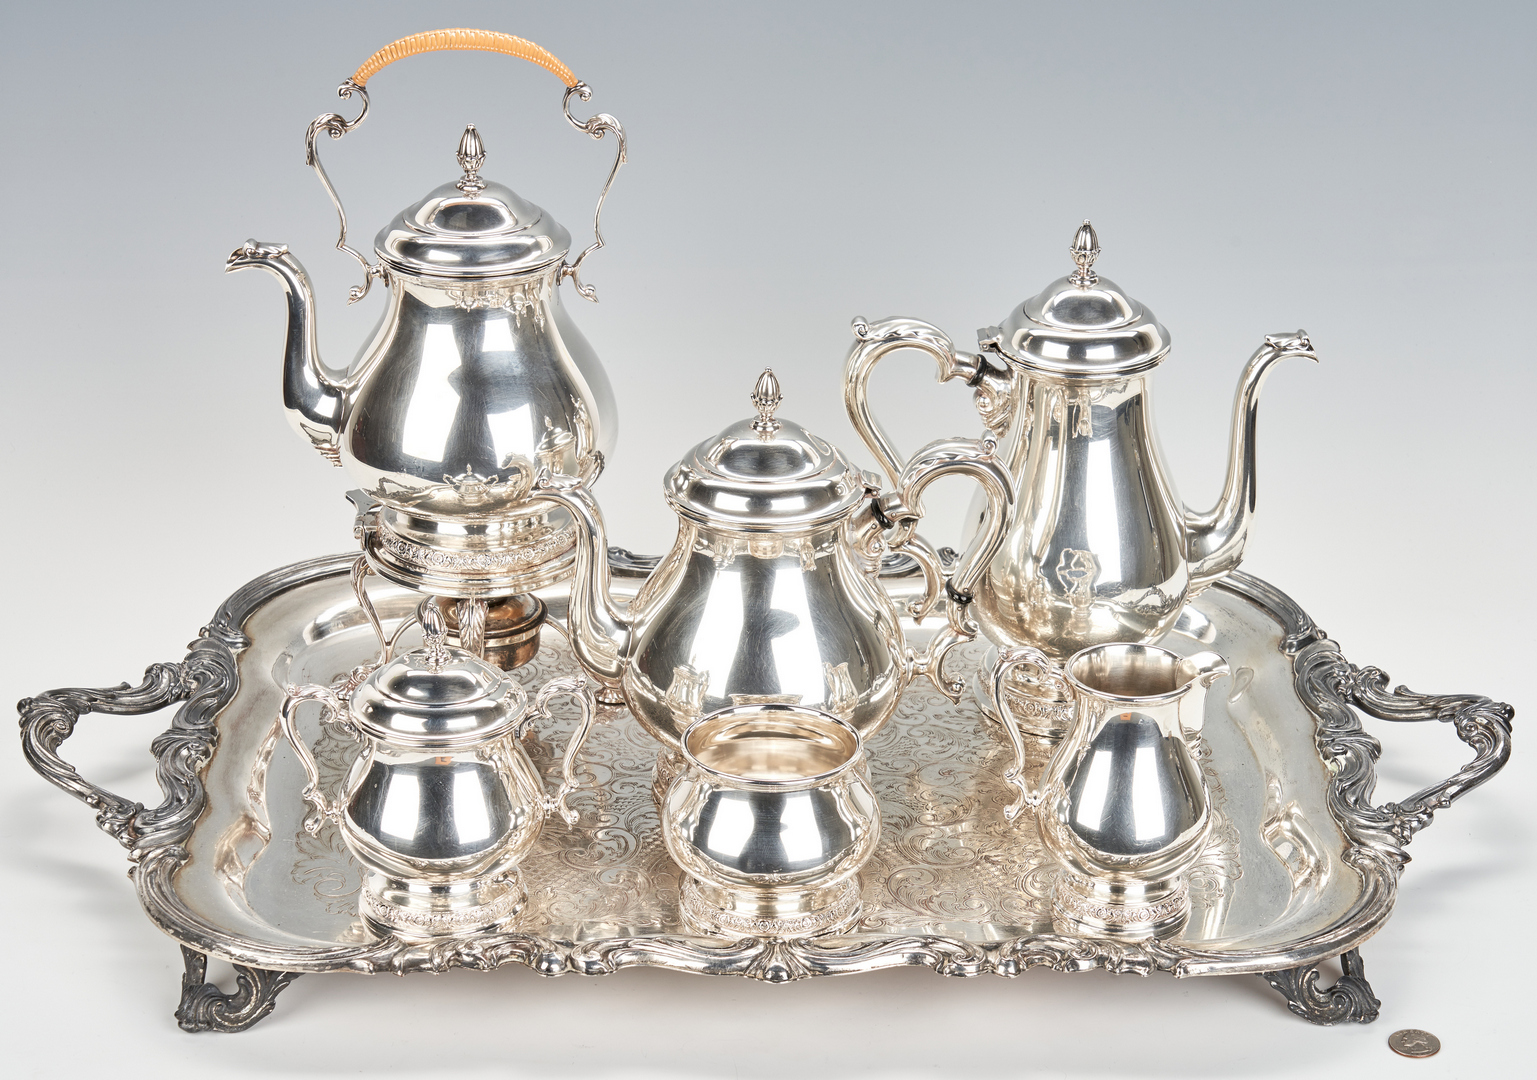 Lot 743: International Prelude Sterling Silver Tea Service, S/P Tray